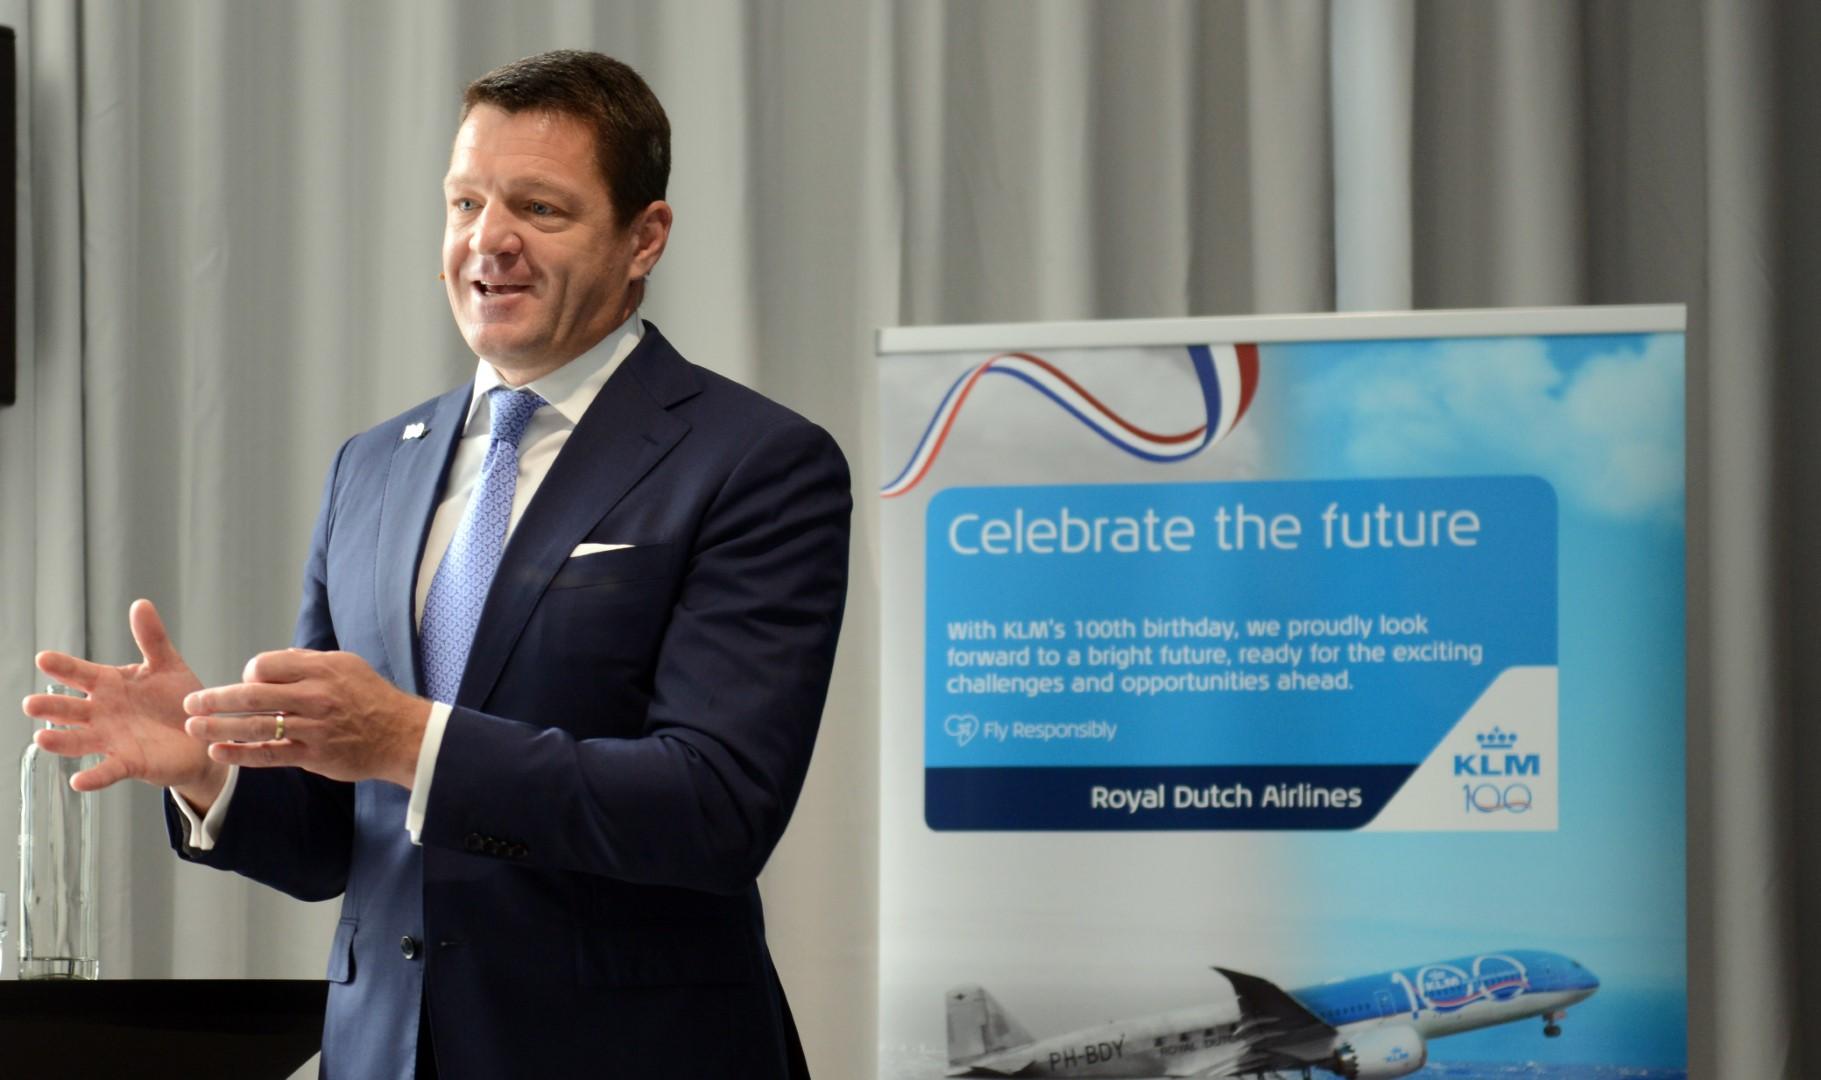 CEO i KLM, Pieter Elbers, gav et indblik i 100 års fødselarens historie. (Foto: Joakim J. Hvistendahl)